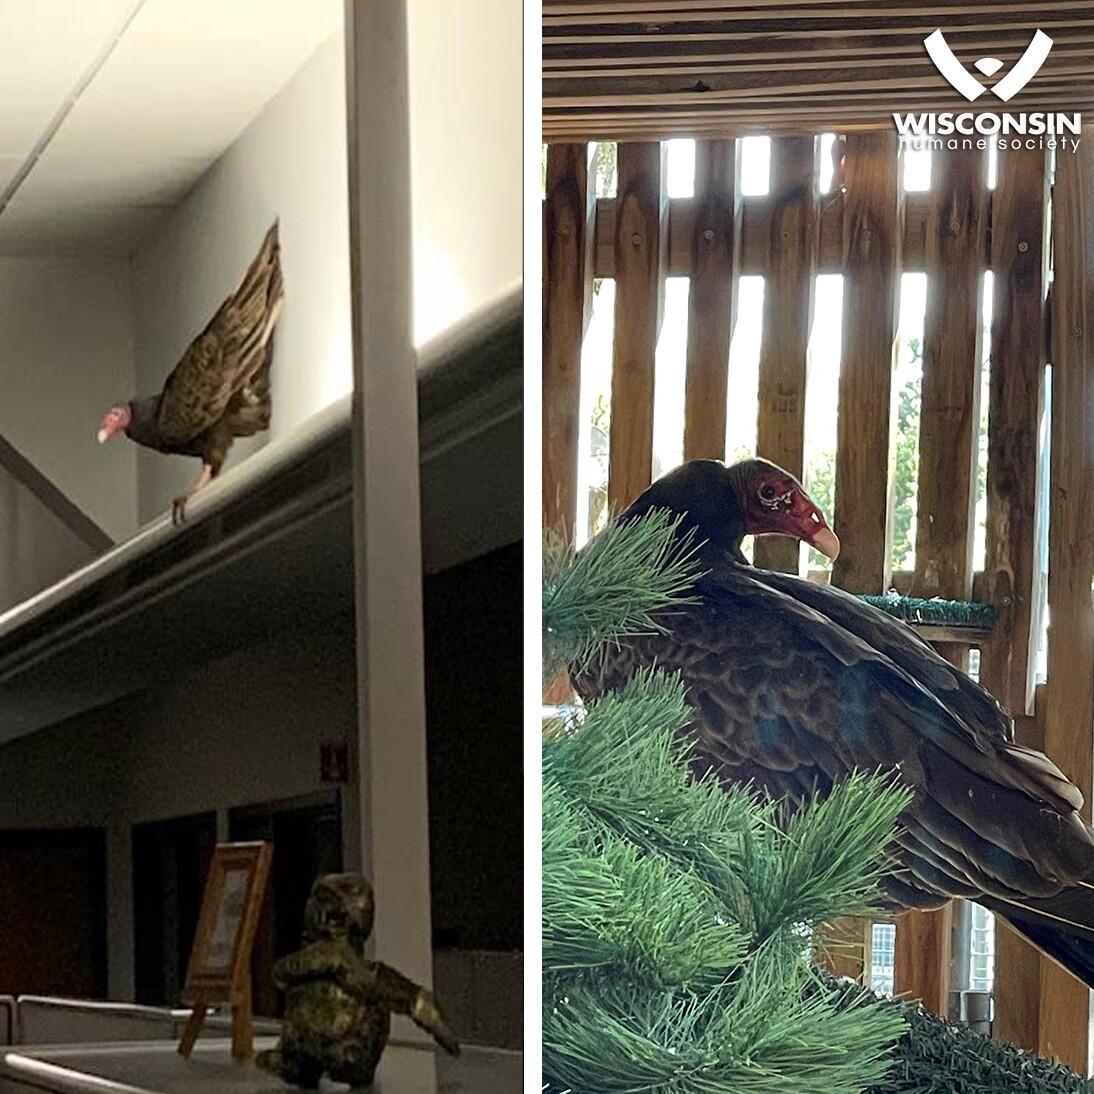 Turkey Vulture FB.jpg